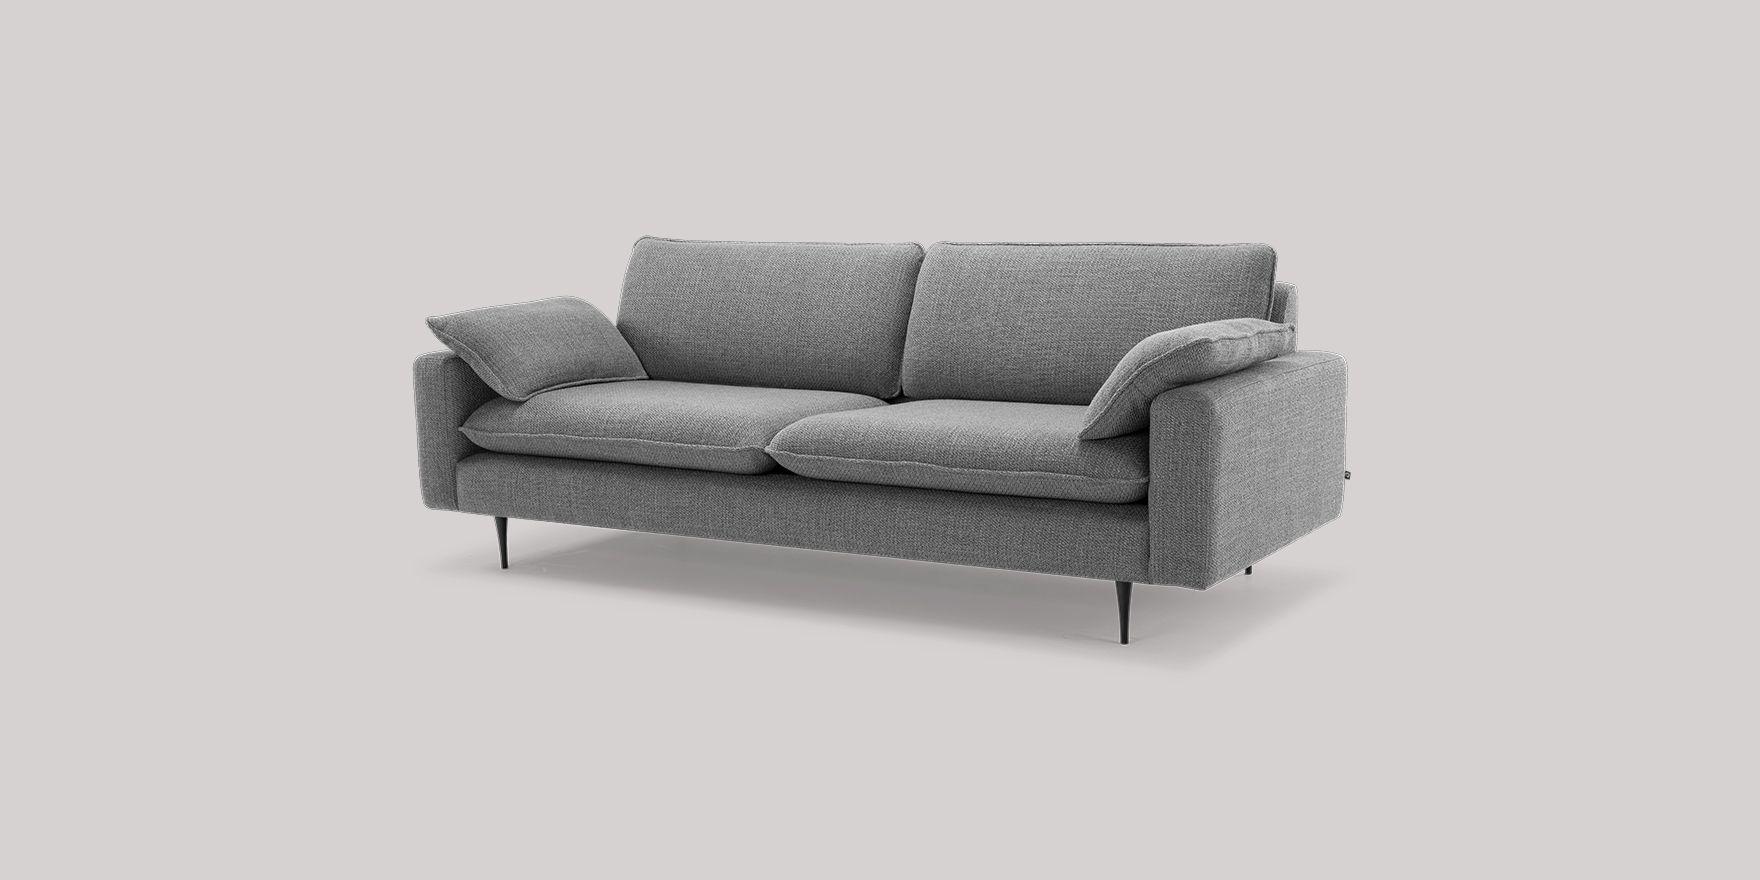 Pin Von Chris Gcknhmr Auf Interieur Design Home 3 Sitzer Sofa Sofas Sofa